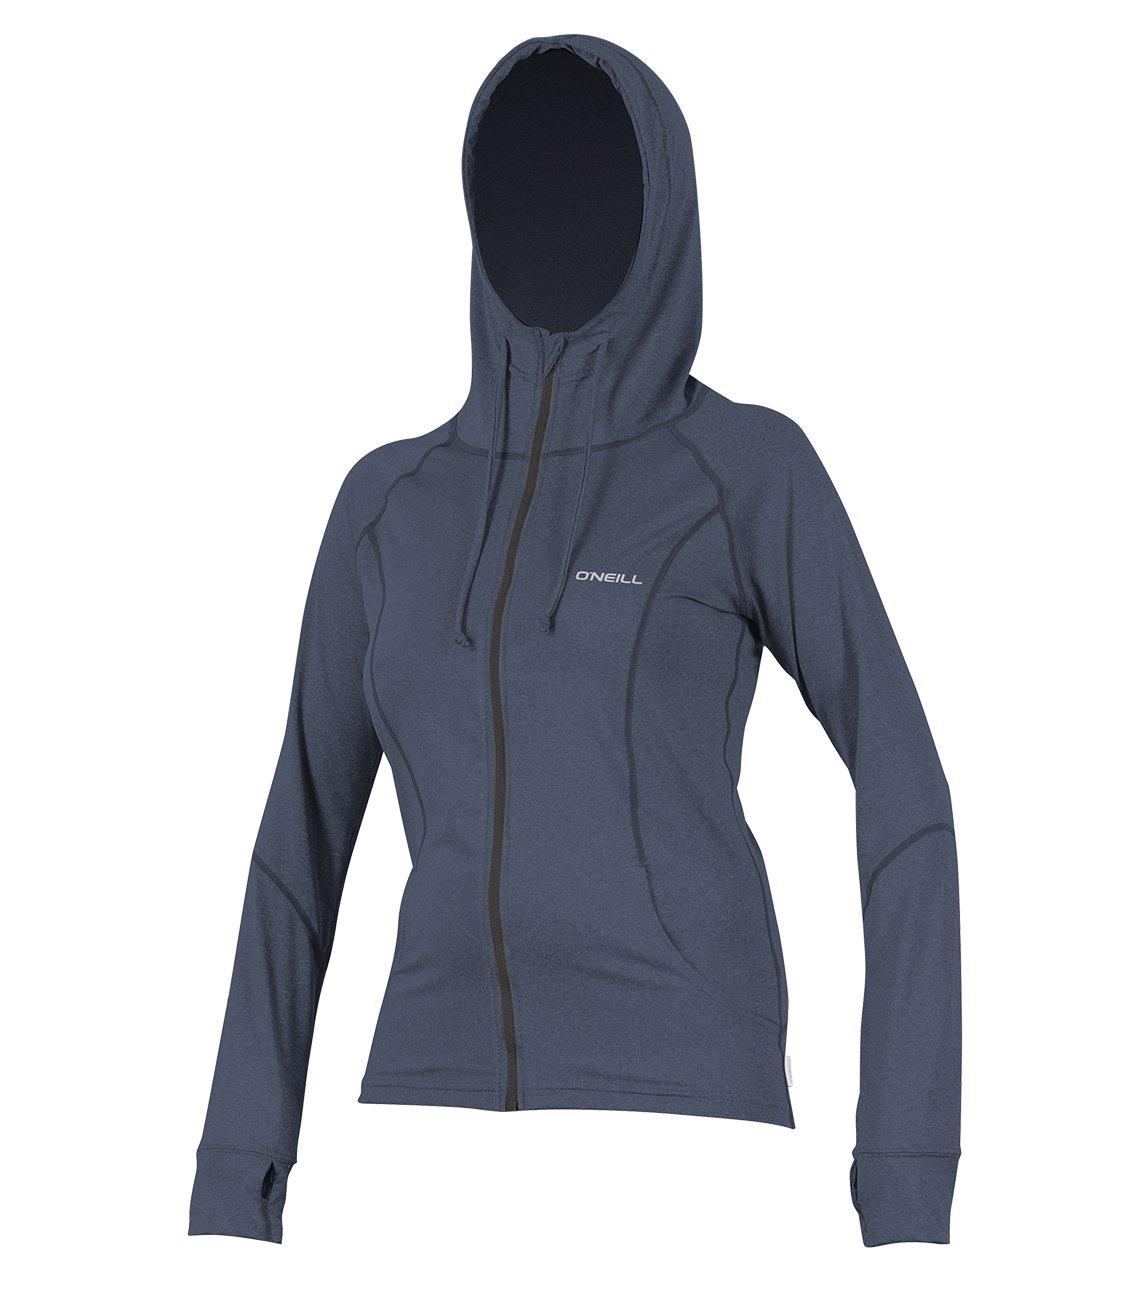 O'Neill Women's Hybrid UPF 50+ Long Sleeve Full Zip Sun Hoodie, Mist, X-Small